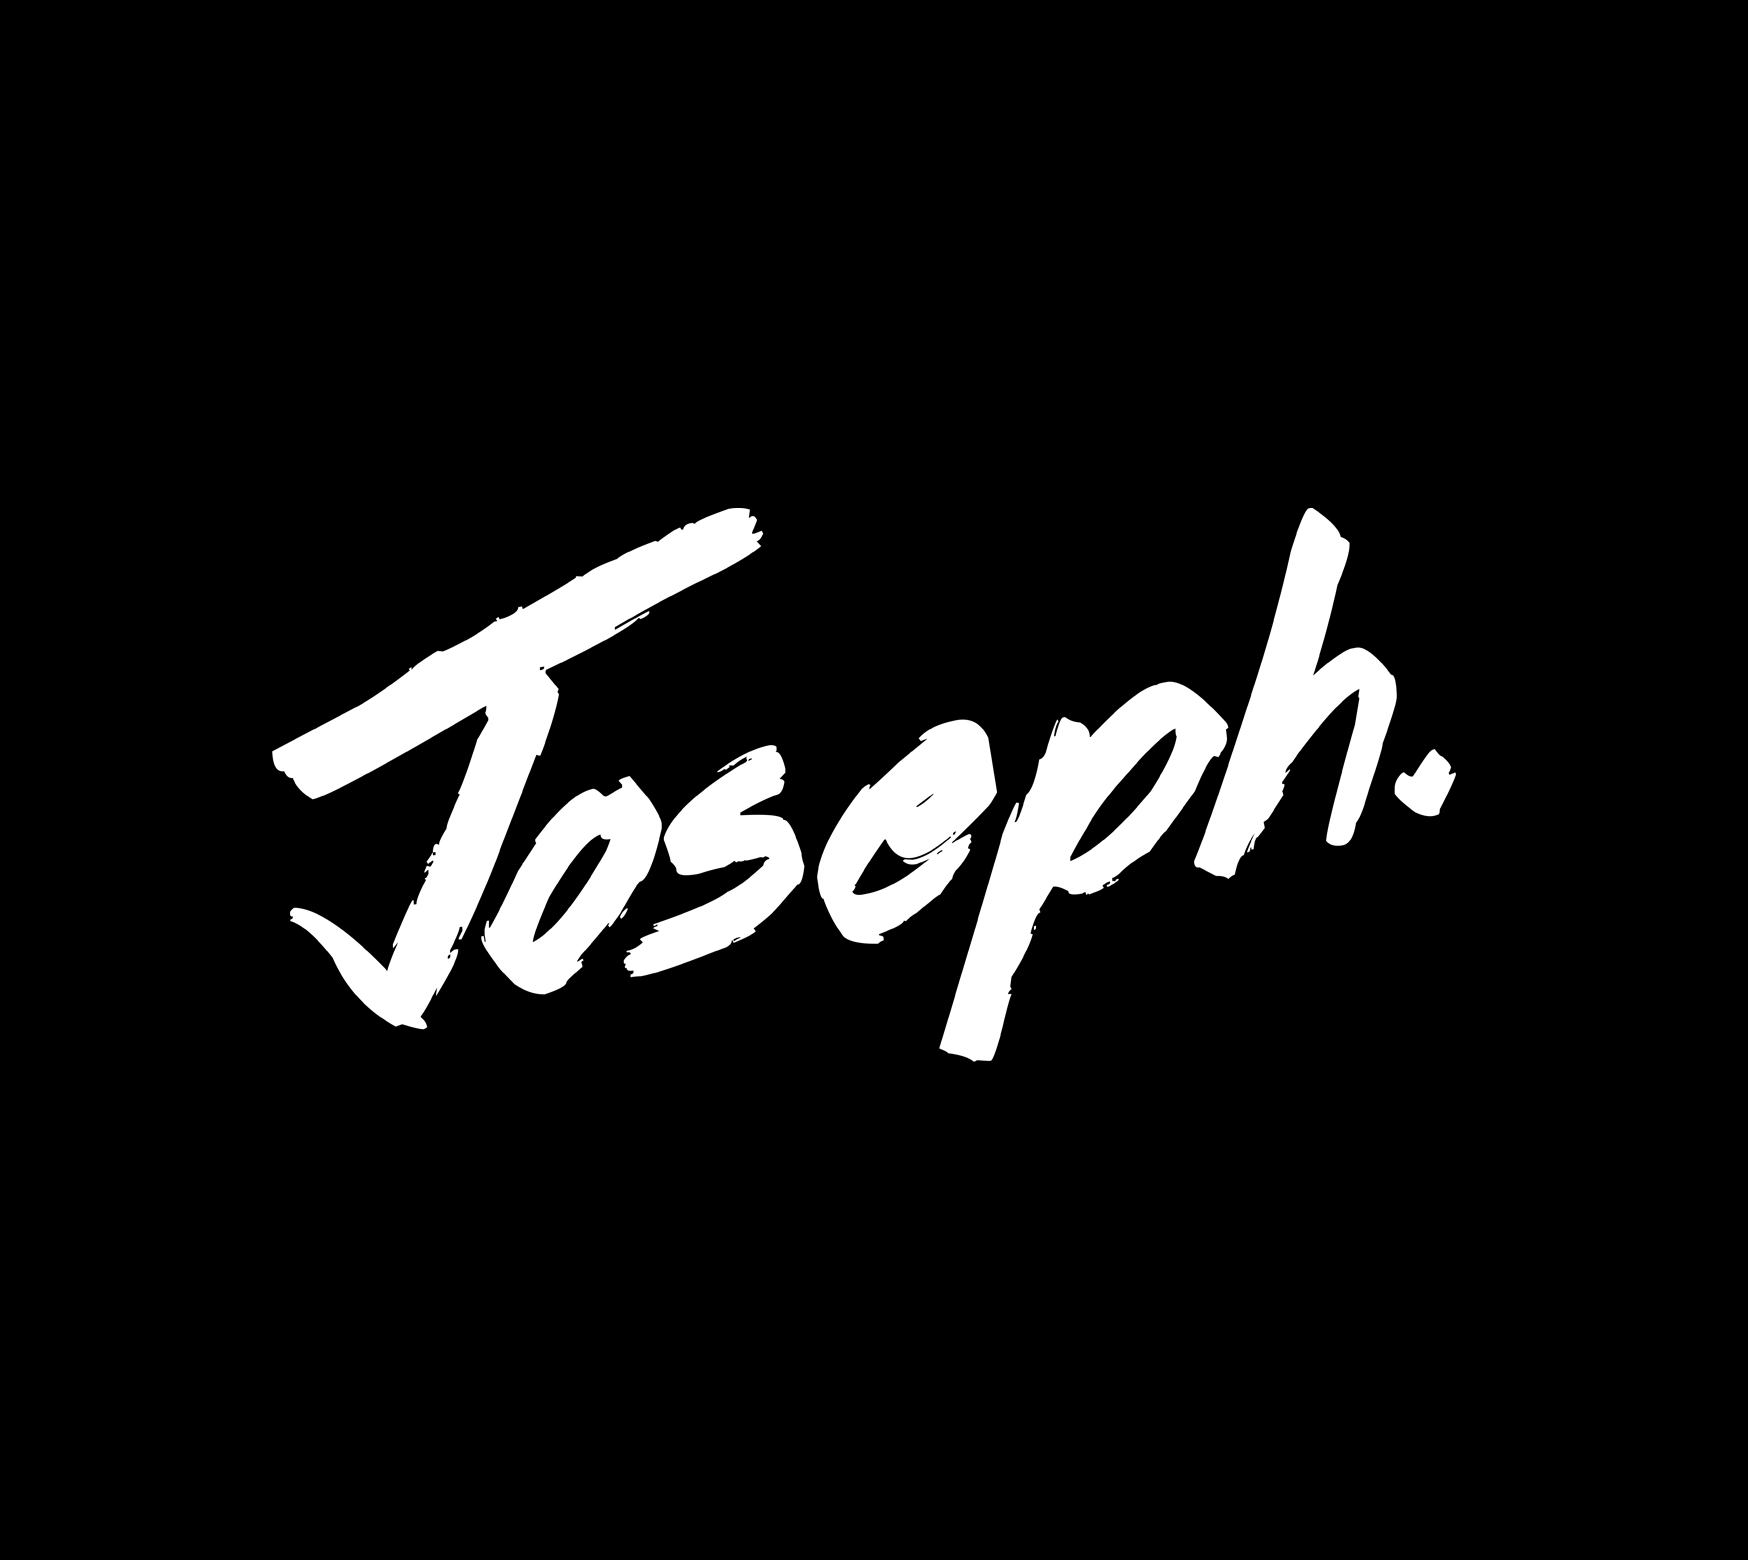 joseph logo lbfn